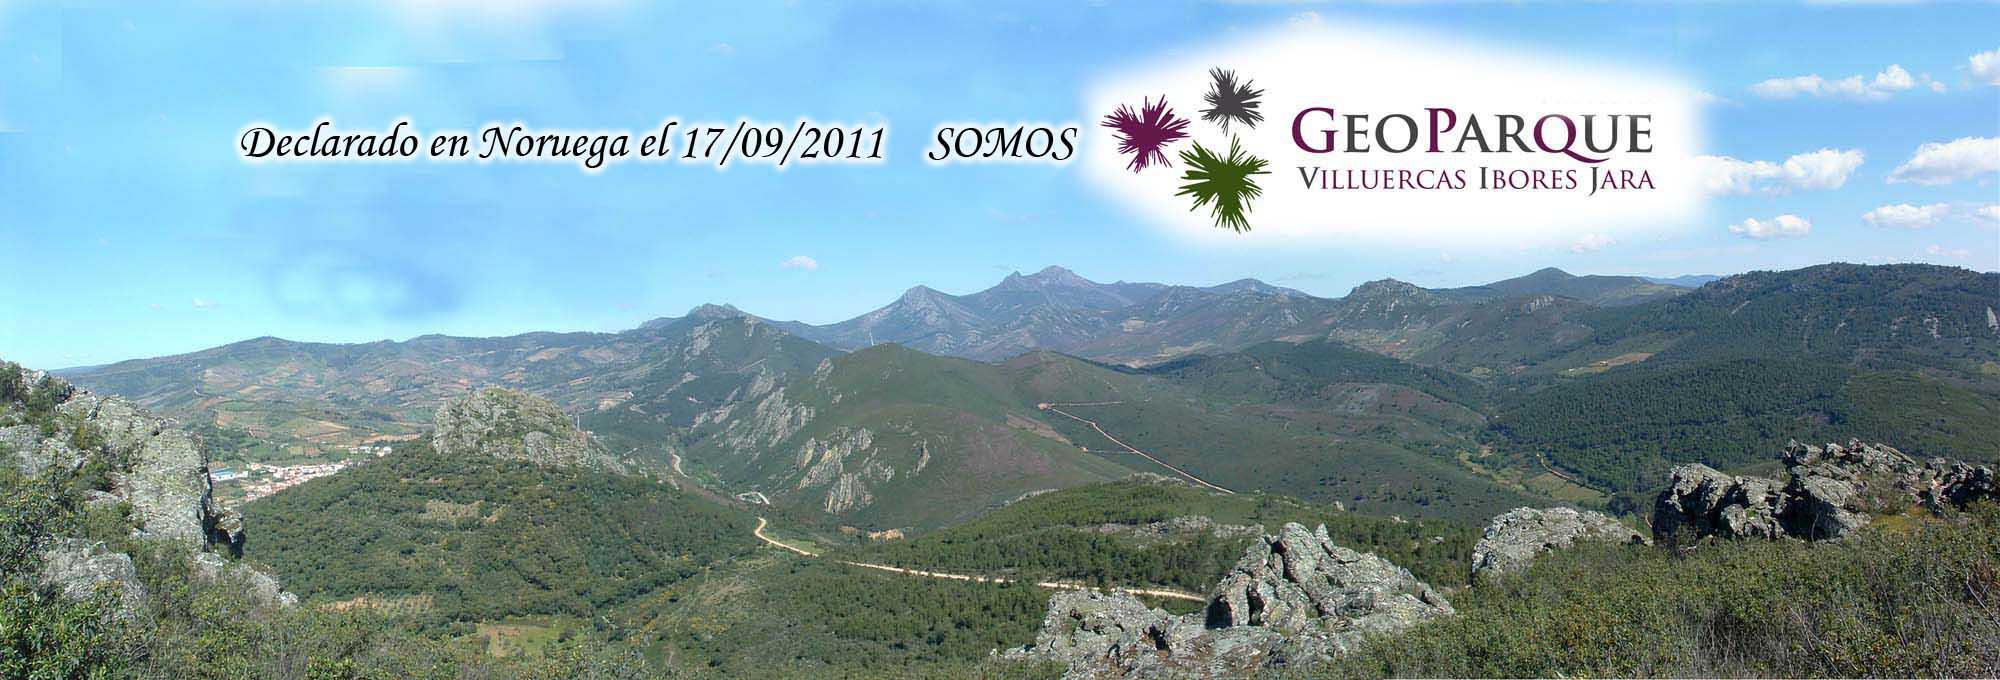 Geo Parque Villuercas-Ibores-Jara